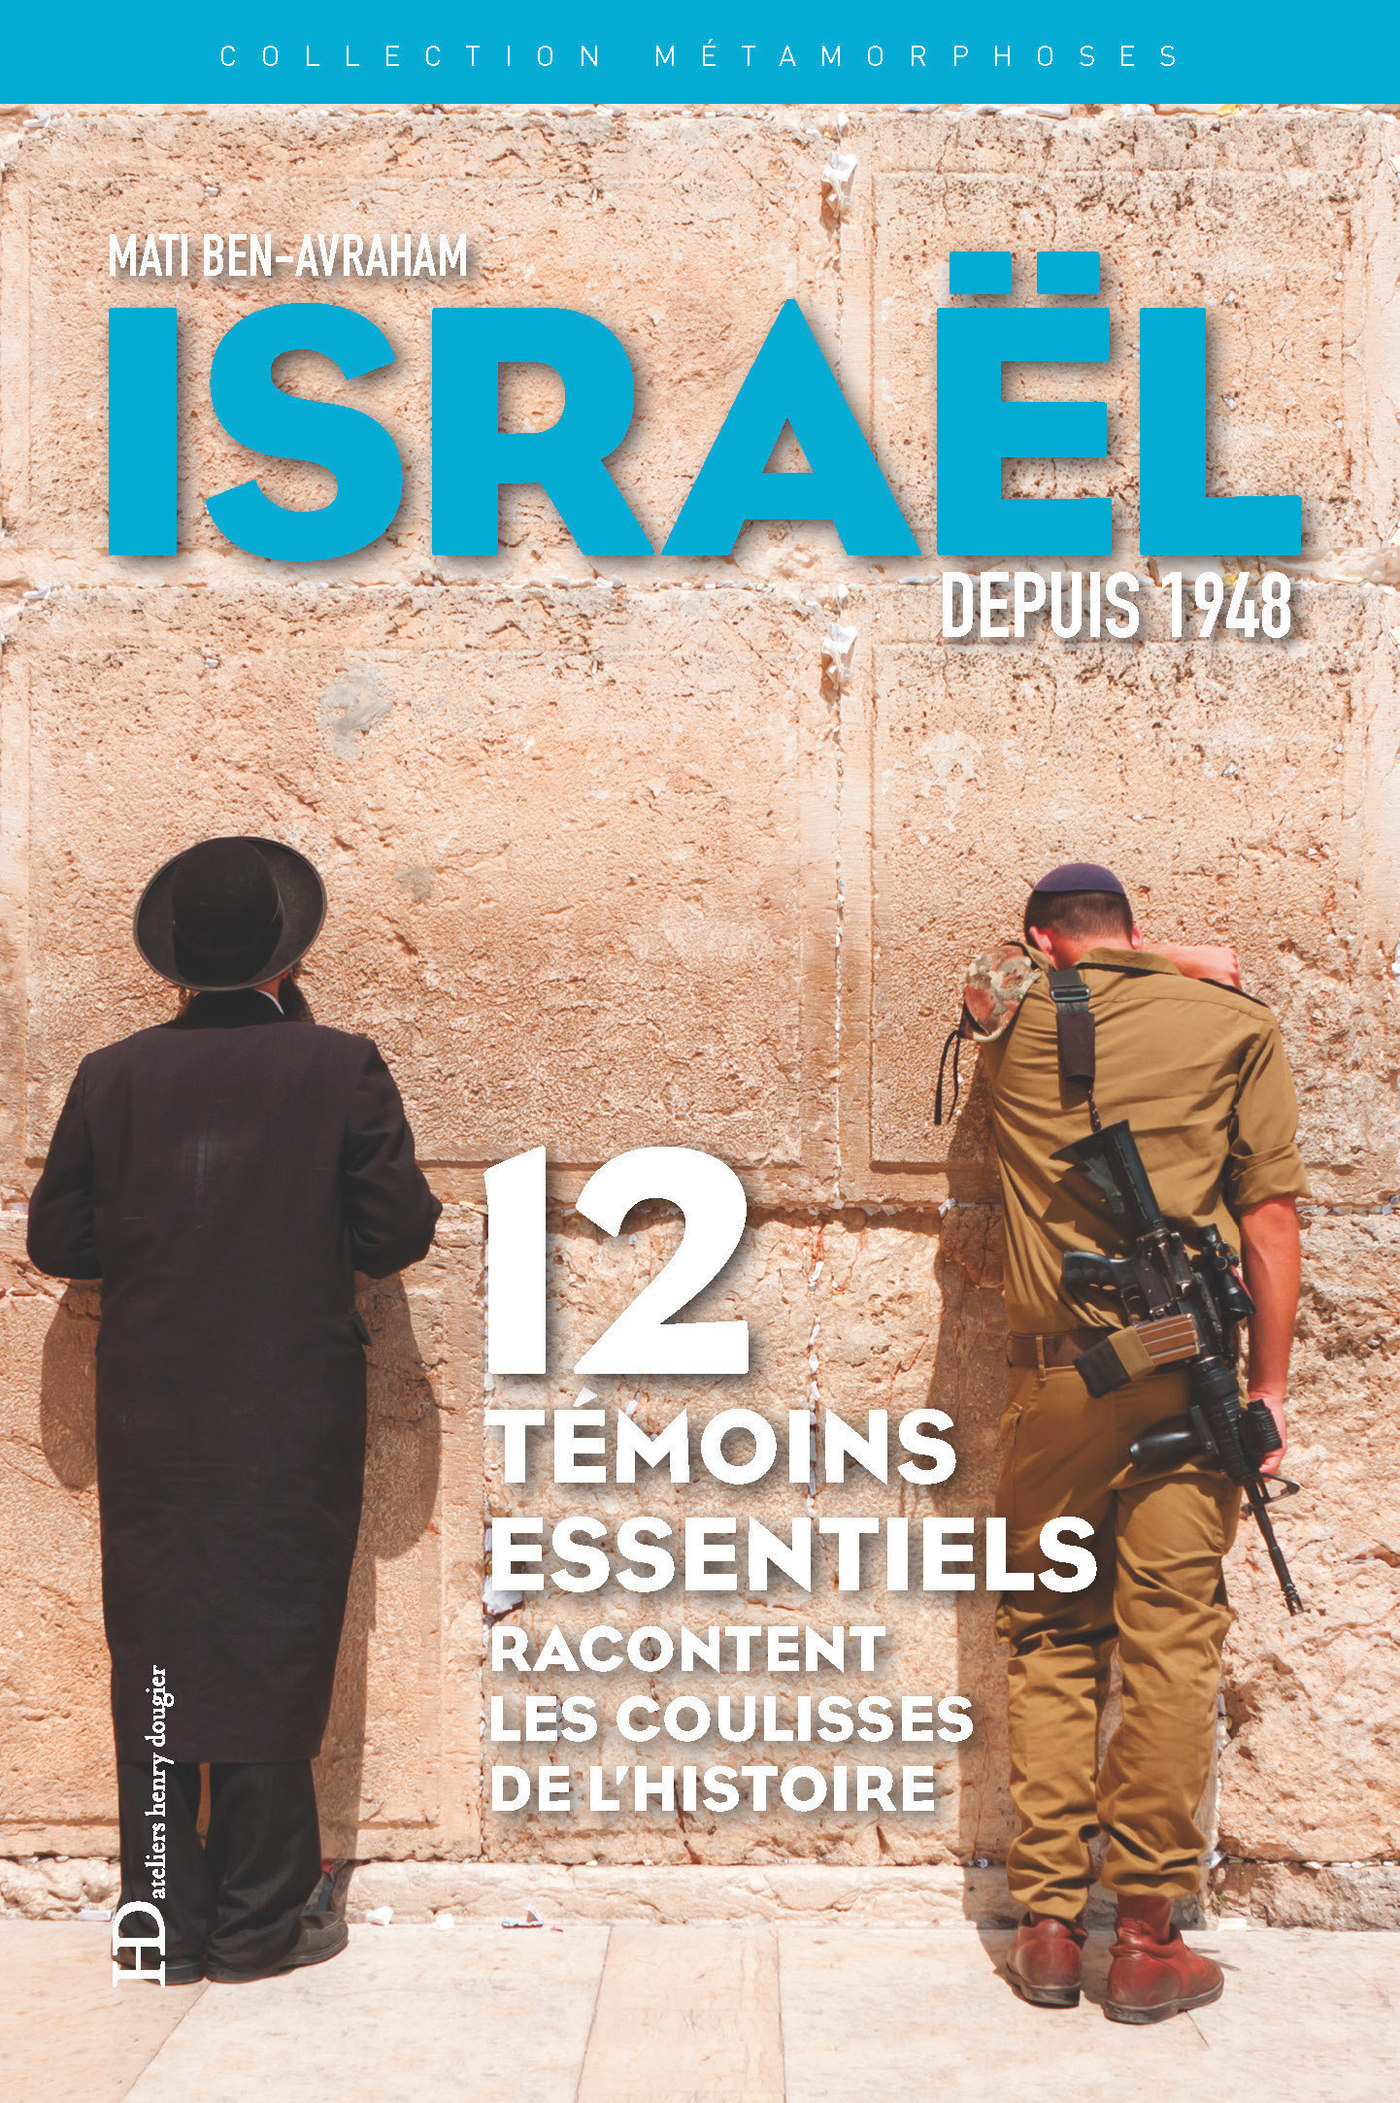 Métamorphoses d'Israël depu...